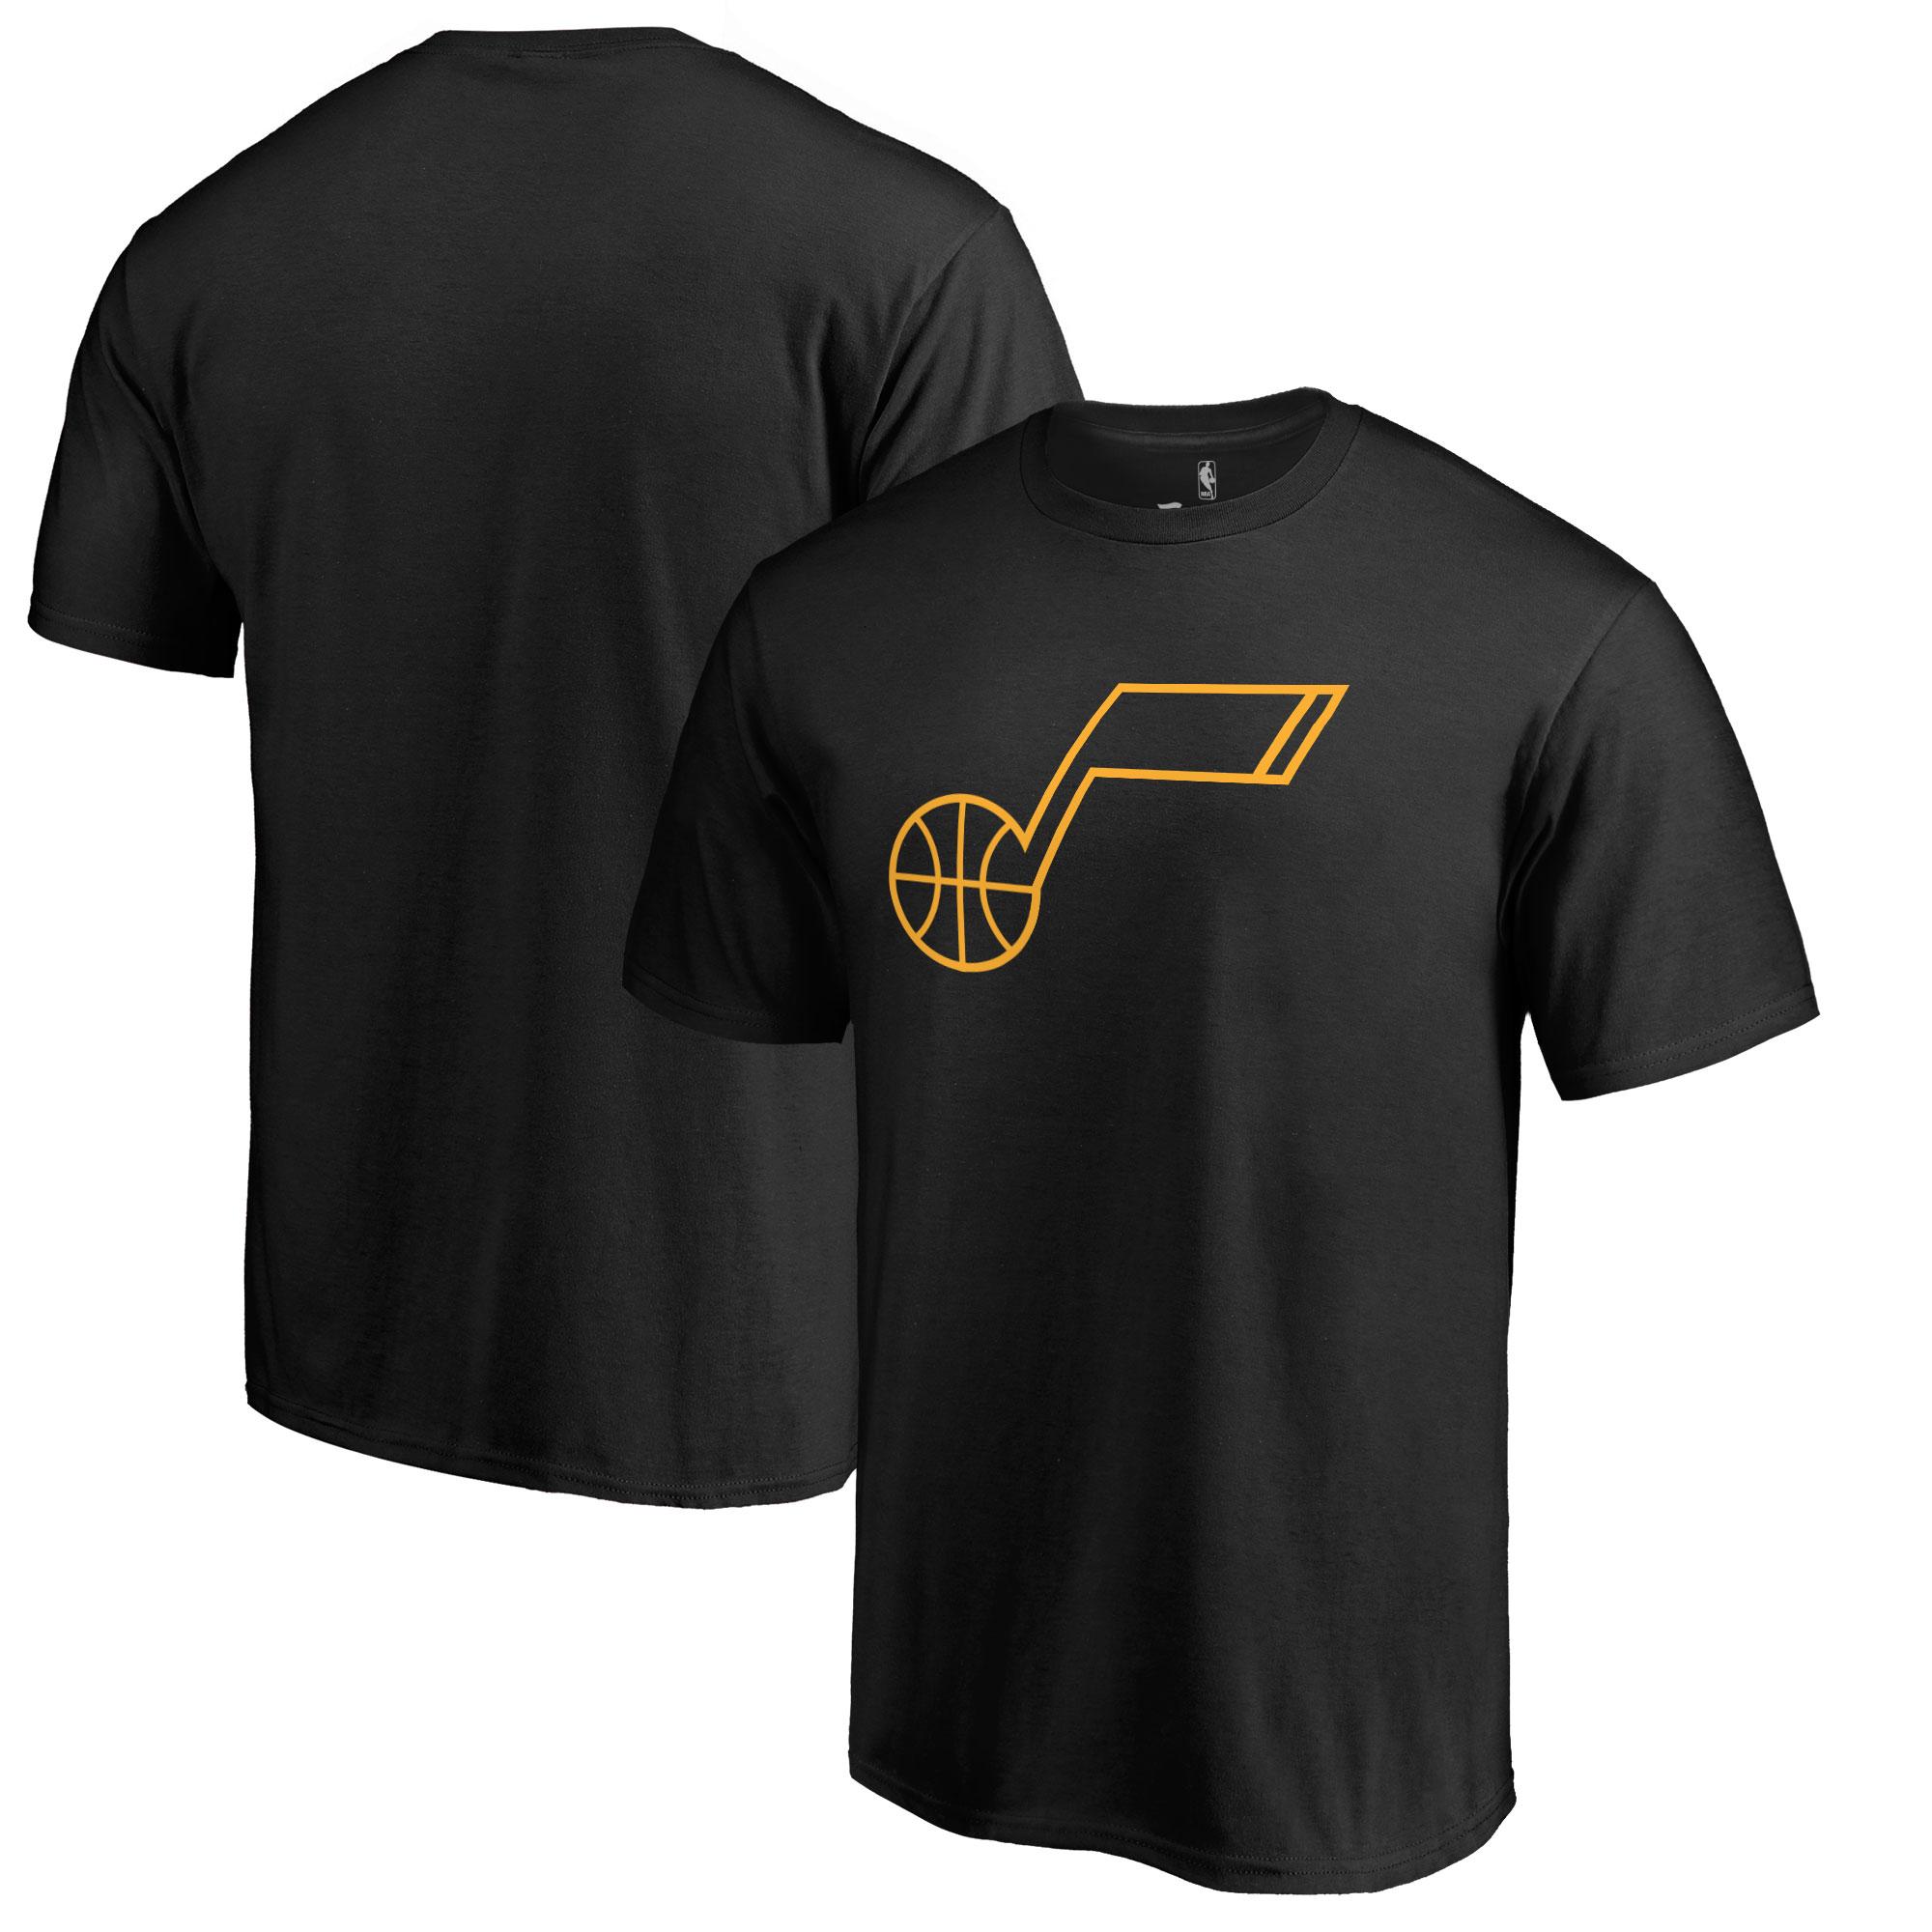 Utah Jazz Fanatics Branded Taylor T-Shirt - Black